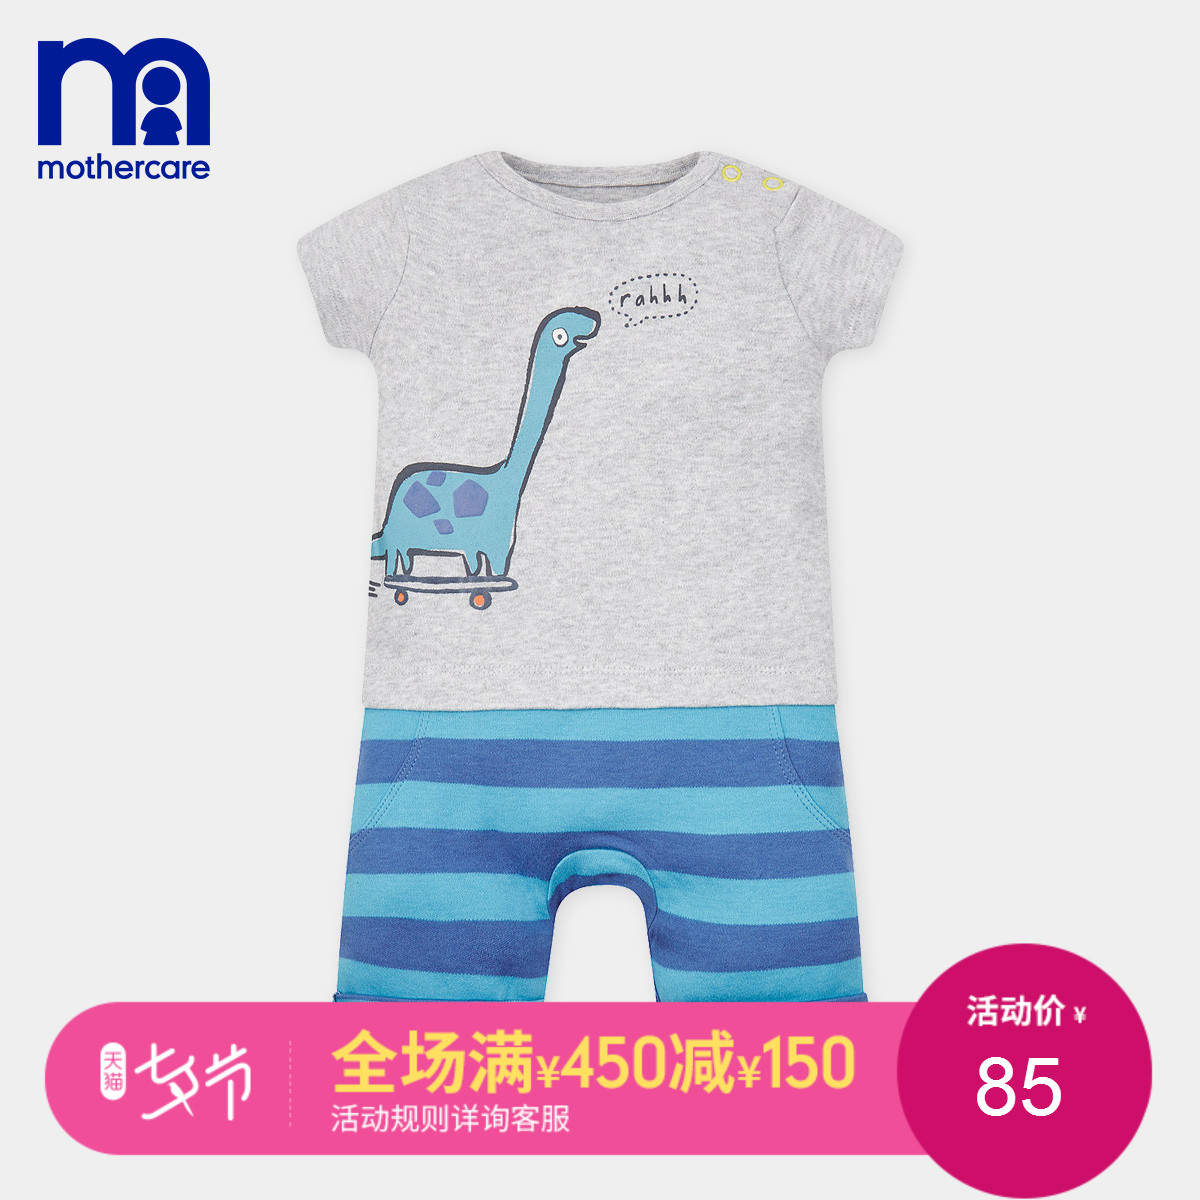 mothercare男婴儿连体衣棉质短袖清仓特价小船恐龙新生儿衣服